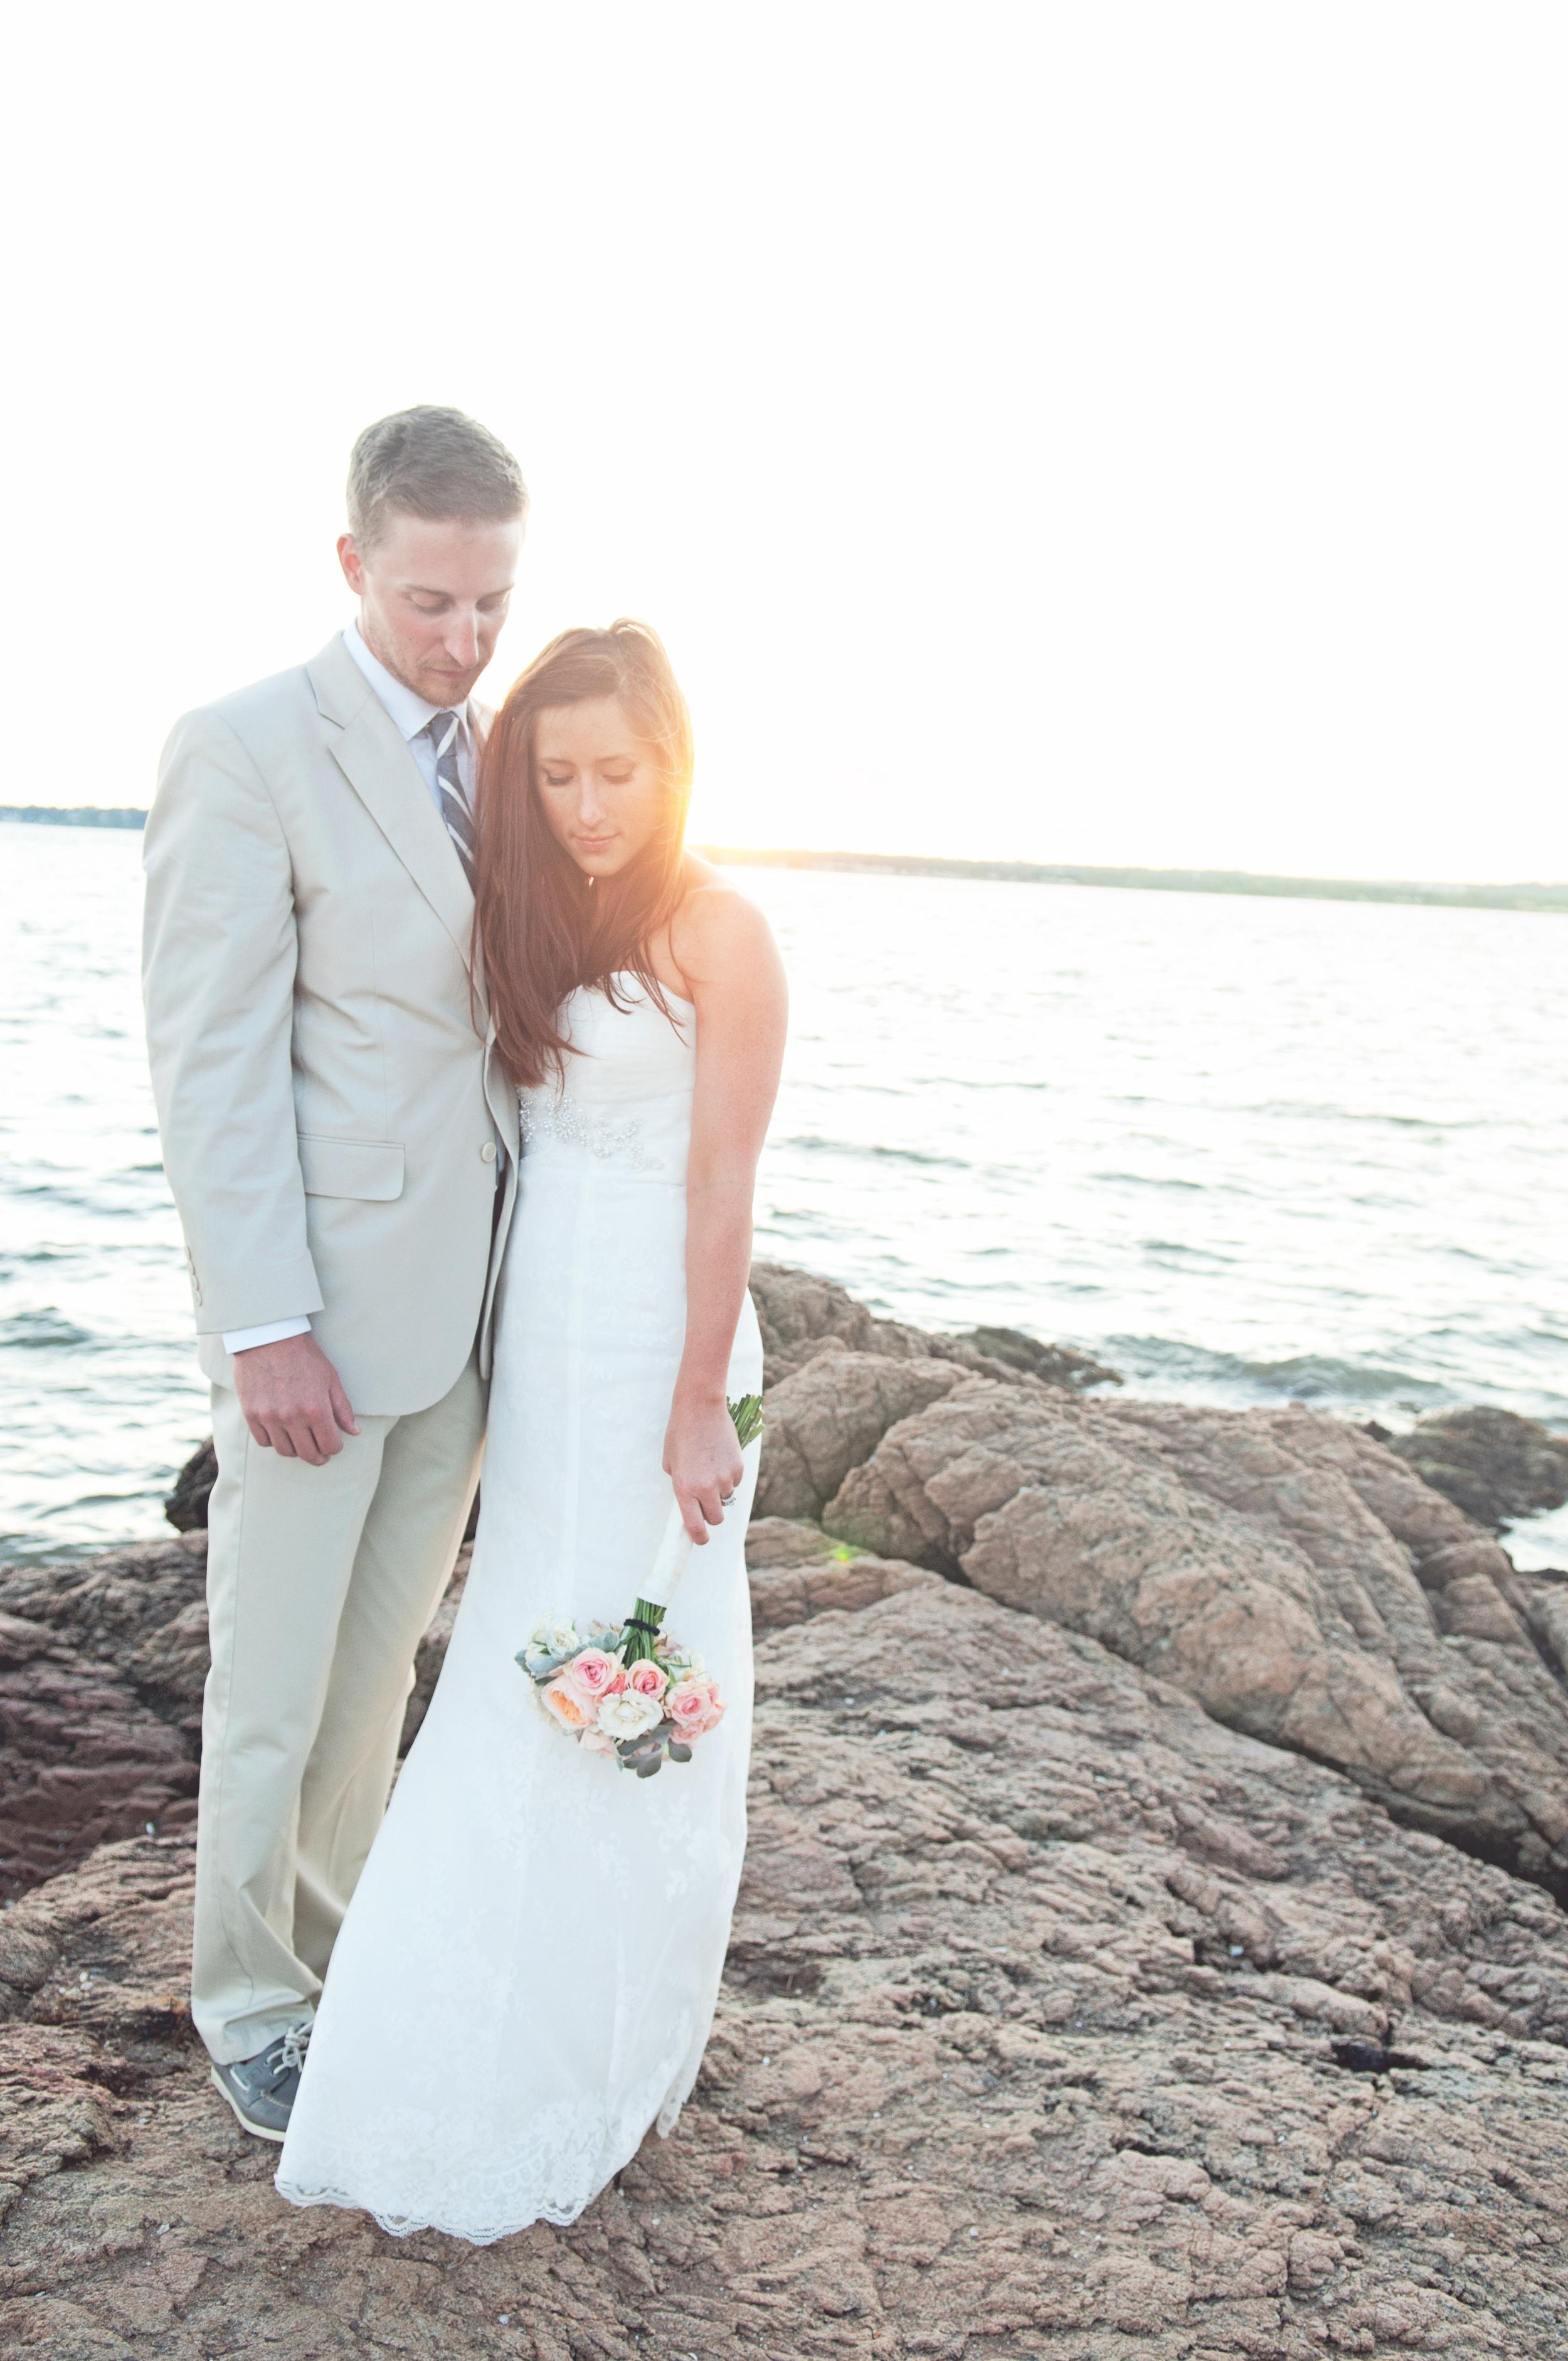 Angela_Chicoski_CT_wedding_photographer_073.jpg